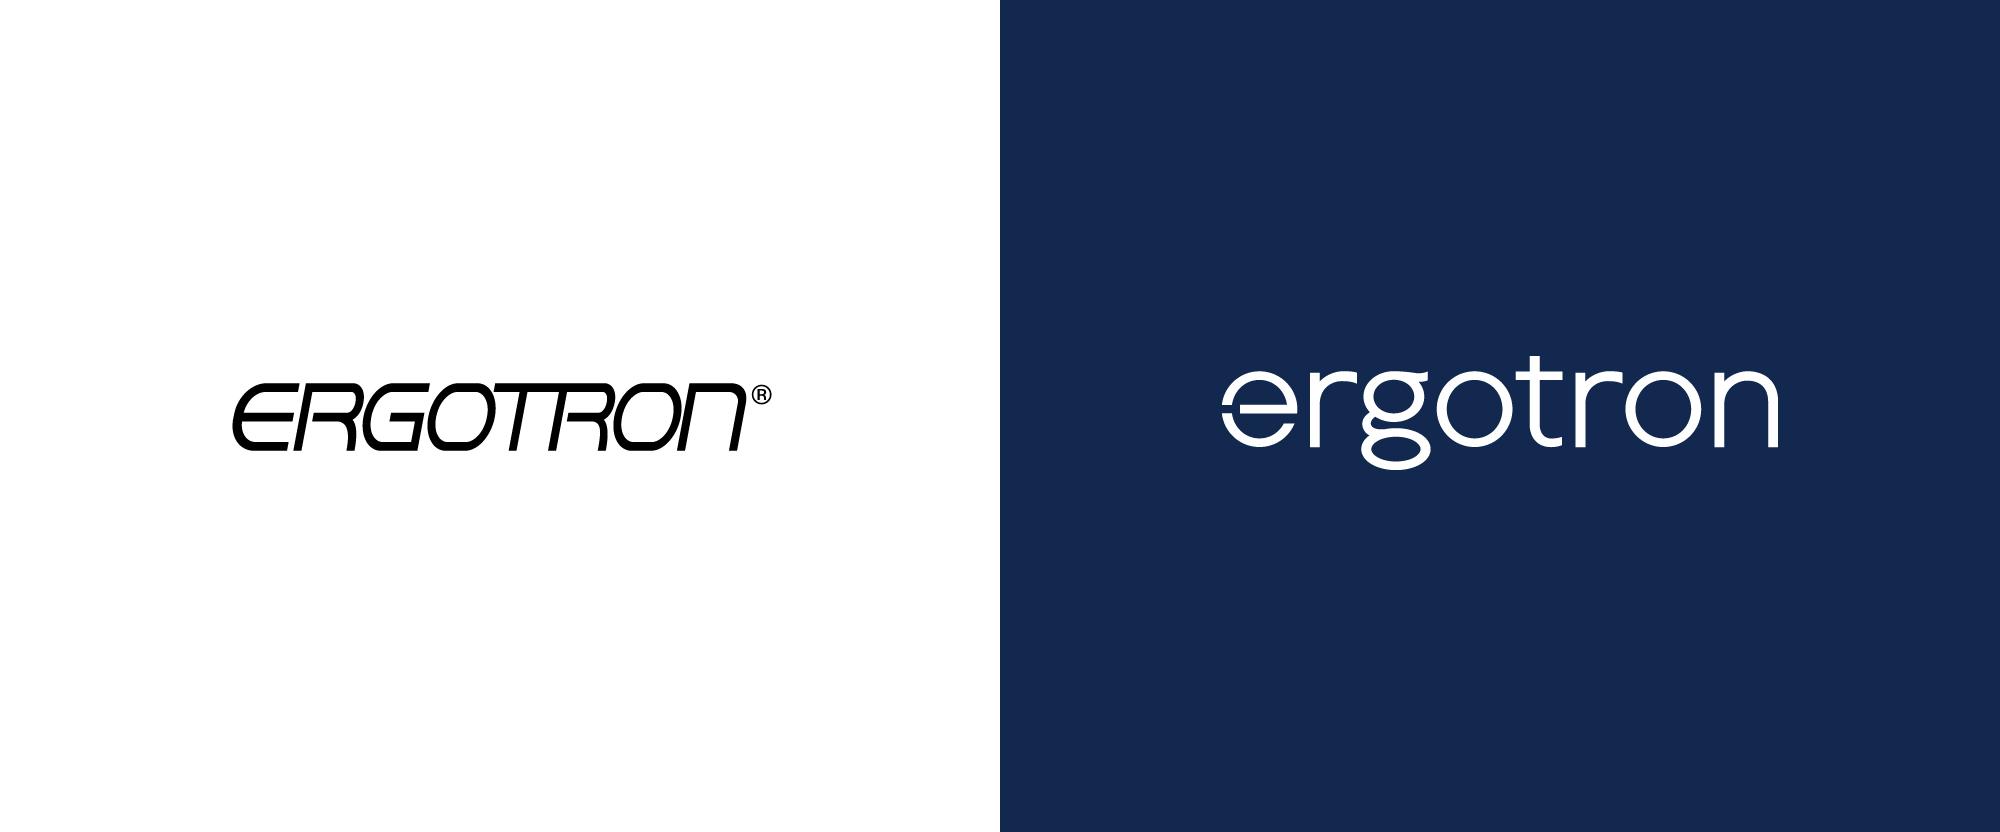 Feminine Neon Sign Design Resource Transparent Png Premium Image By Rawpixel Com Marinemynt Neon Signs Neon Sign Design